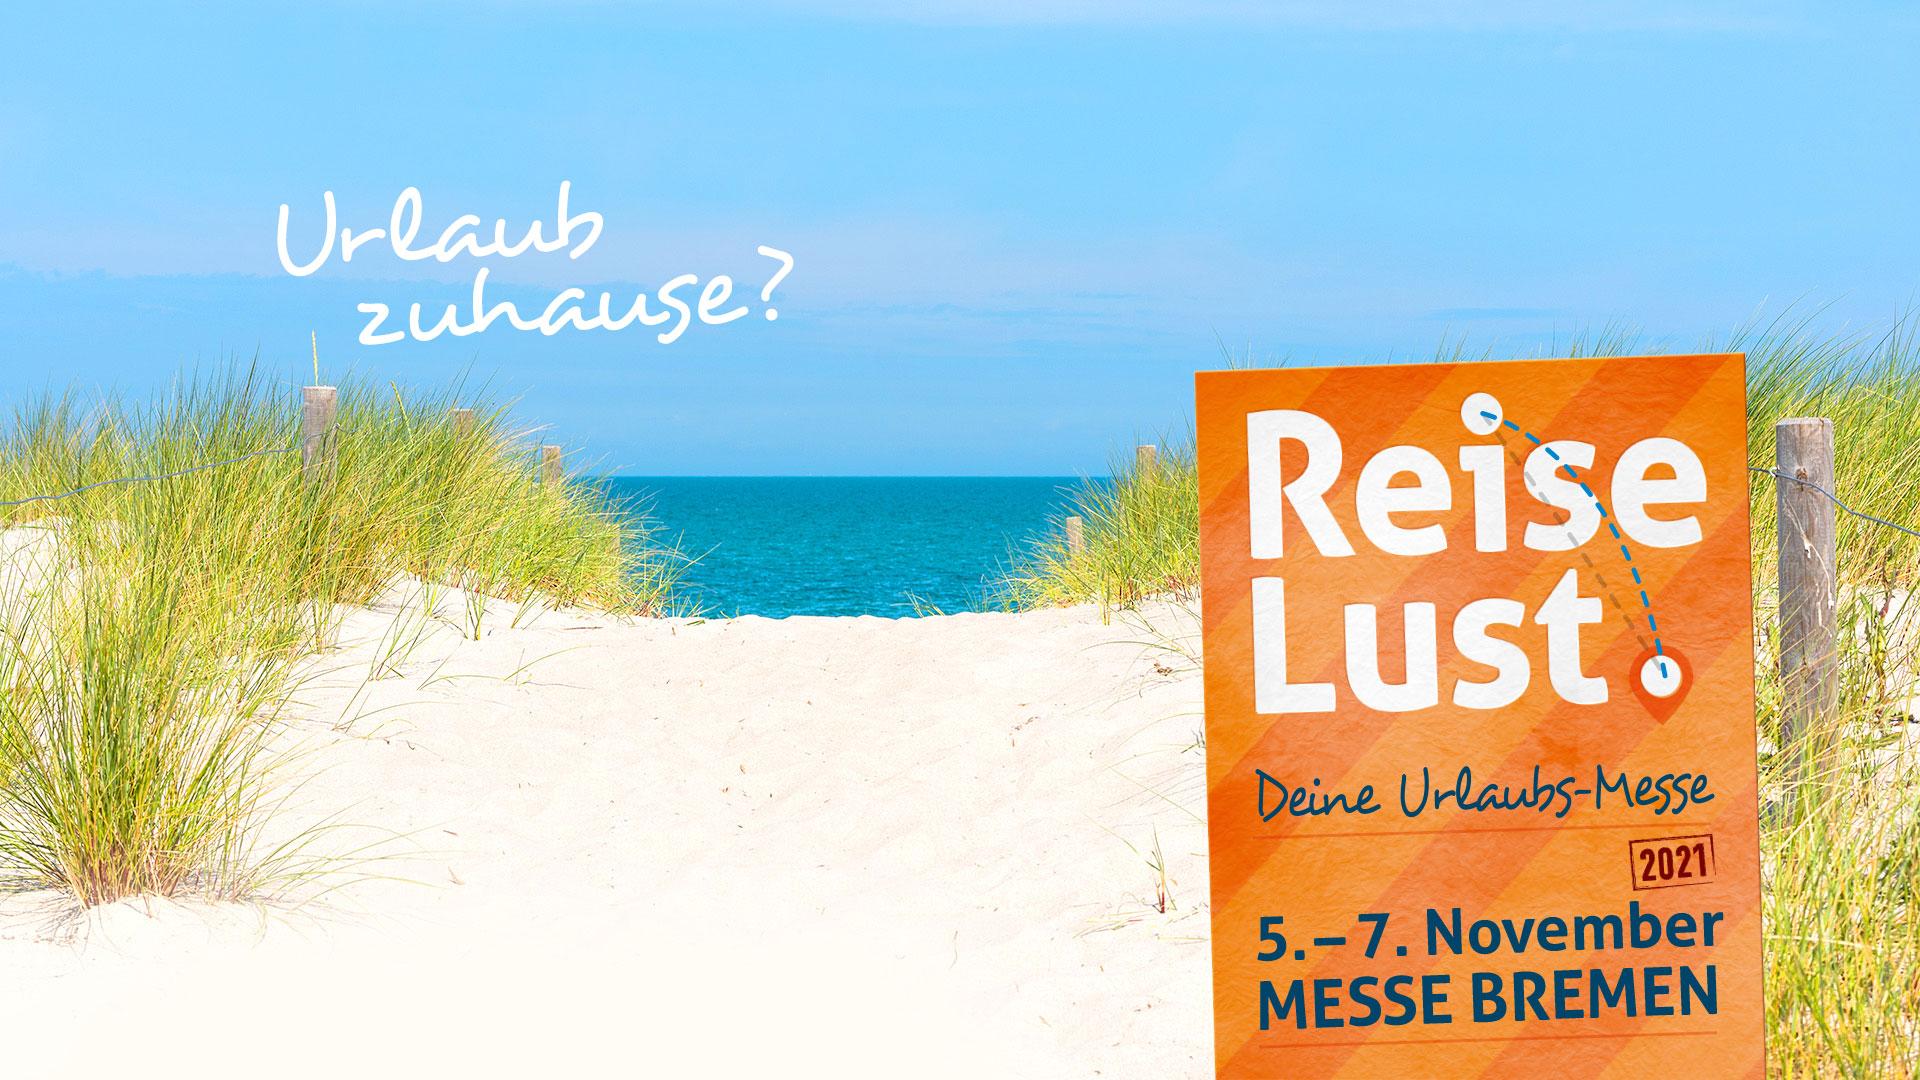 Messe Bremen ReiseLust 2021